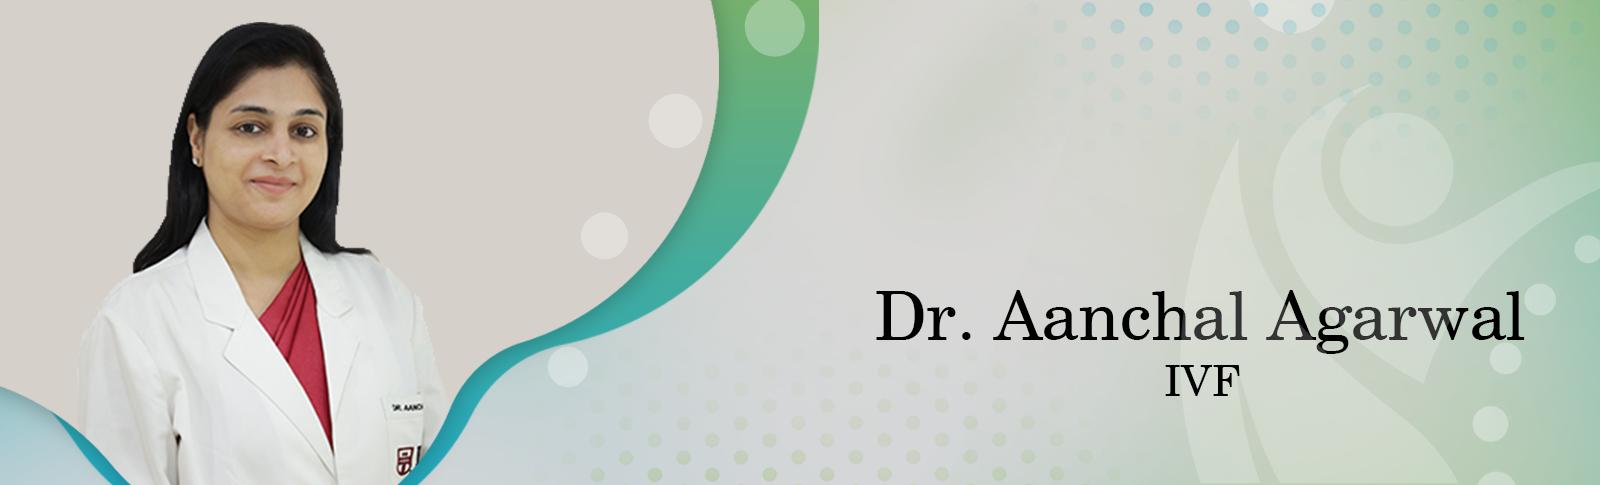 Dr. Anchal Aggarwal